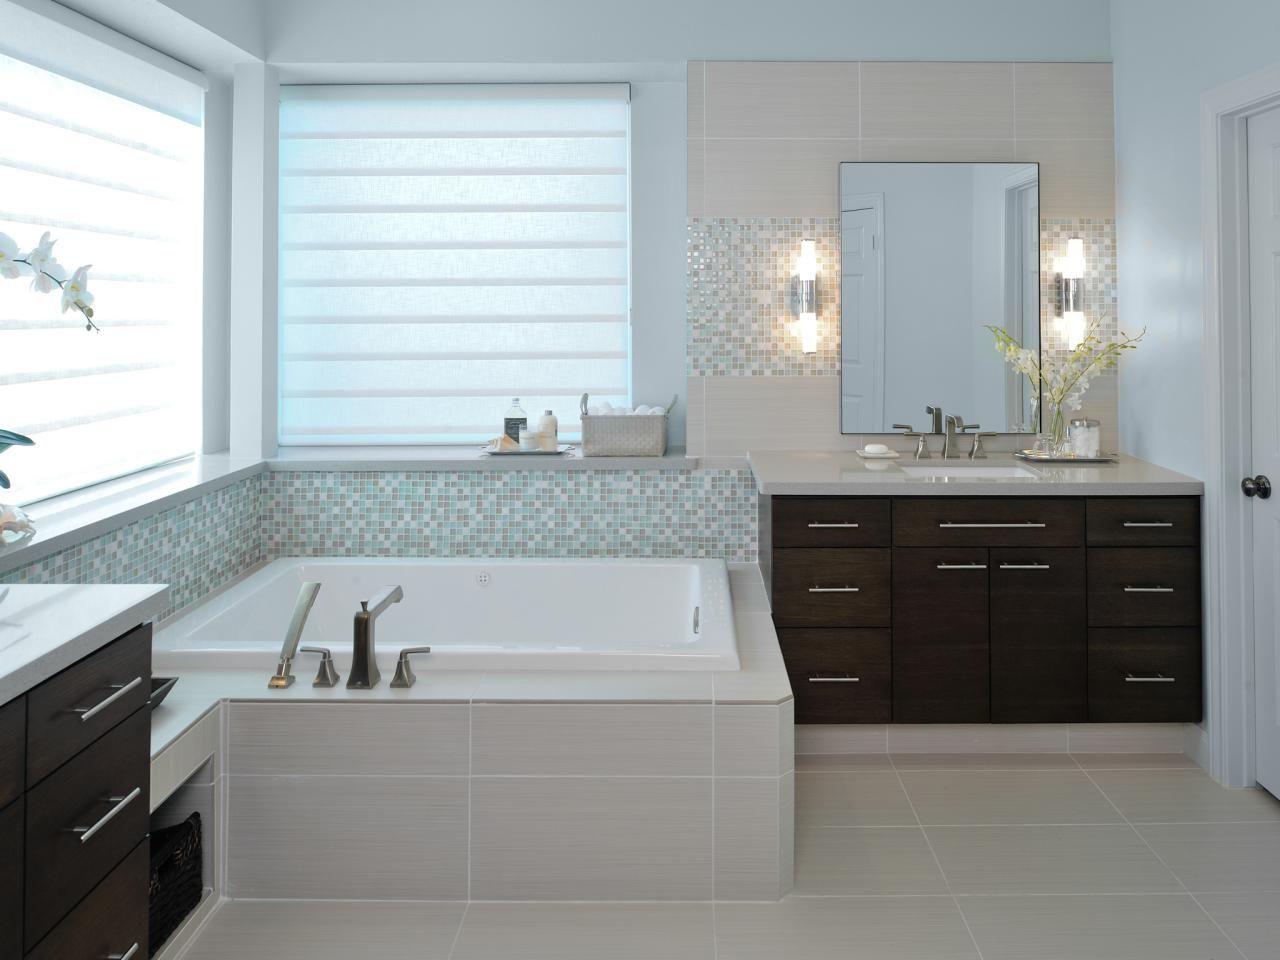 Inspiring Spa-Like Bathrooms | Bathroom | Pinterest | Spa inspired ...